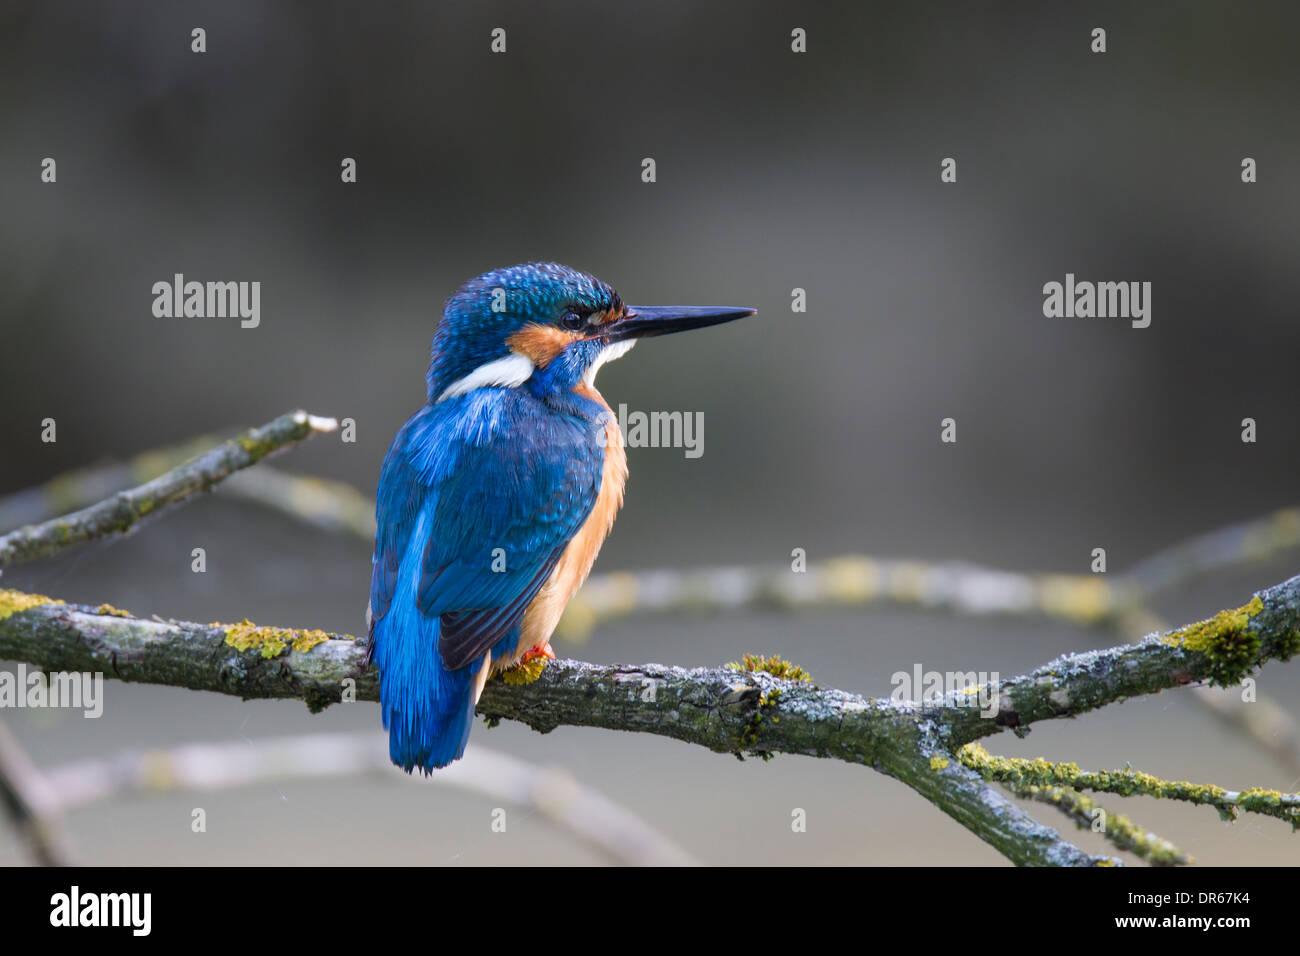 Alcedo atthis Common Kingfisher Eisvogel - Stock Image